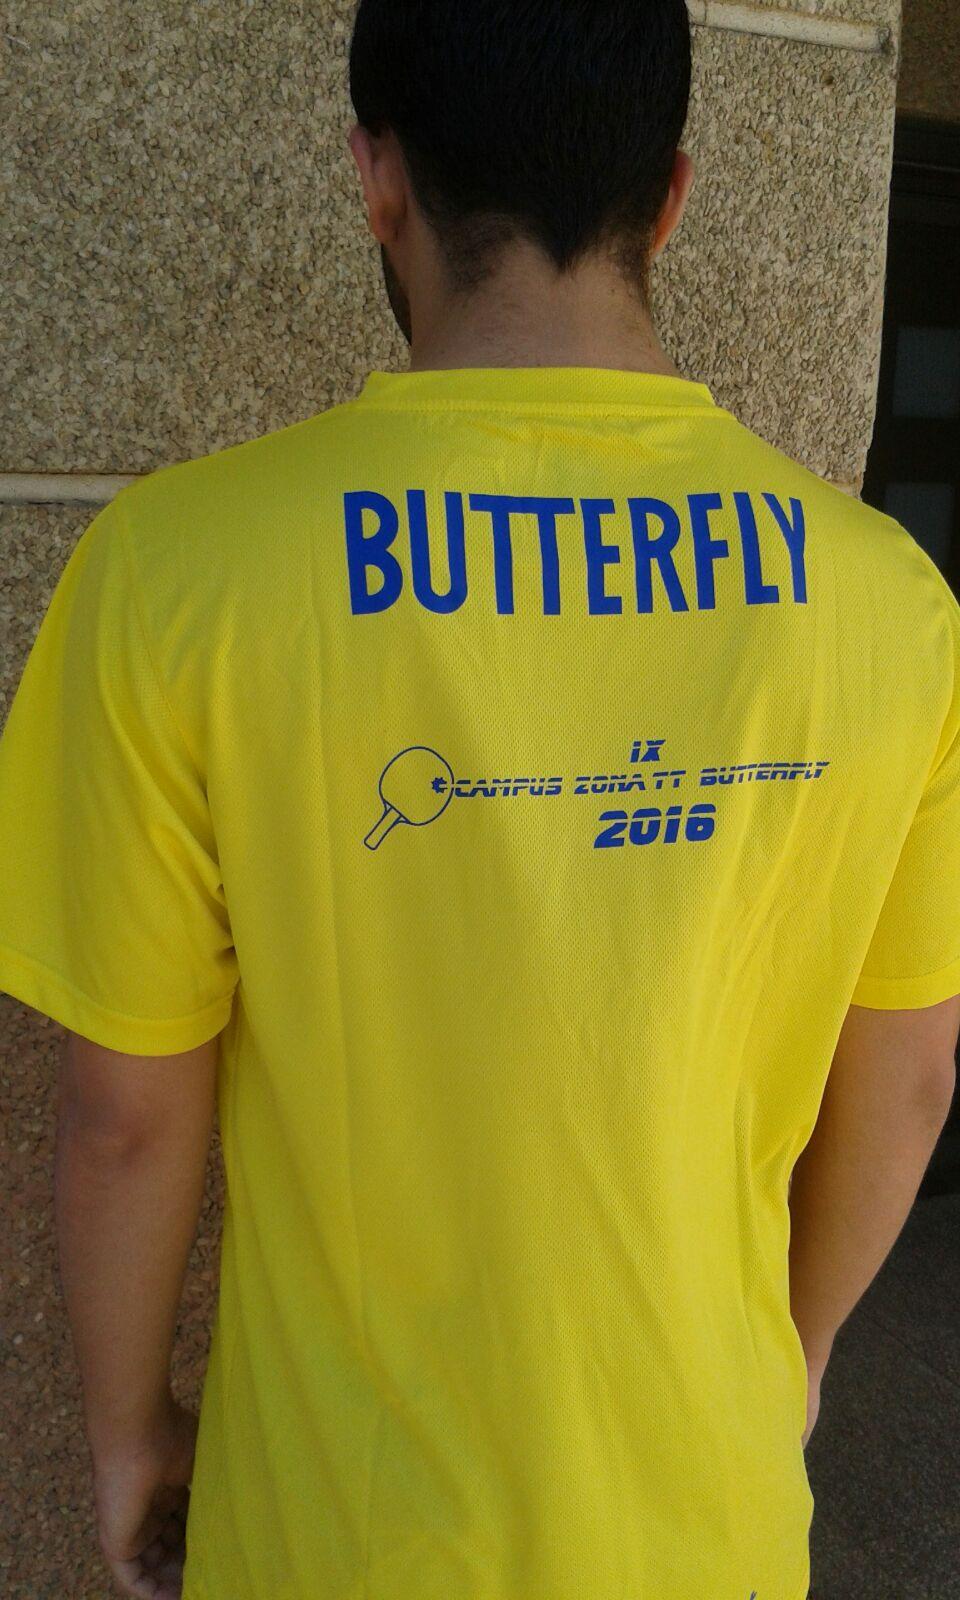 Camisetas Campus ZonaTT-Butterfly 2016